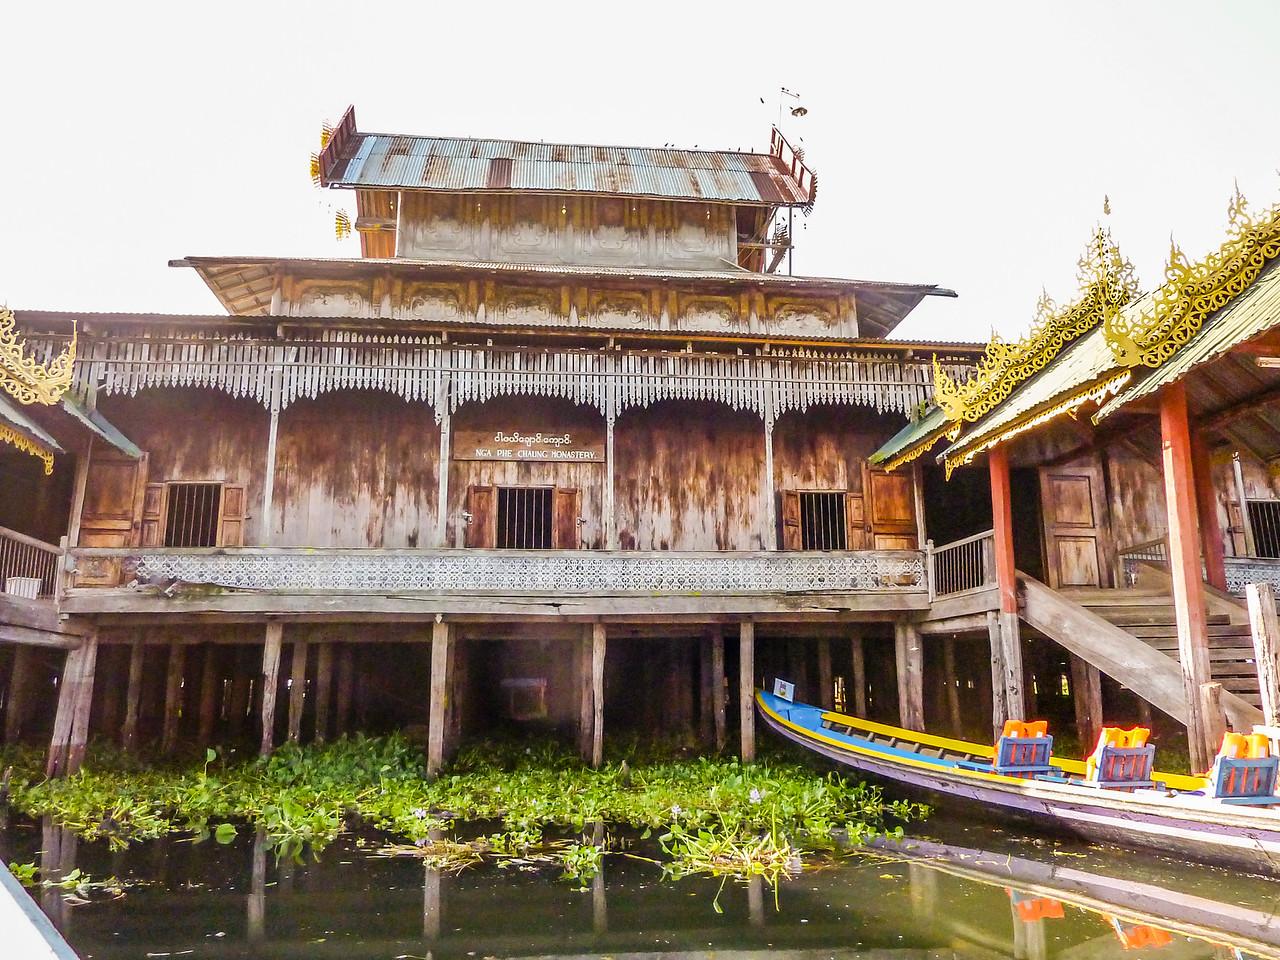 Nga Hpe Kyaung - Jumping Cat Monastery, Inle Lake, Myanmar